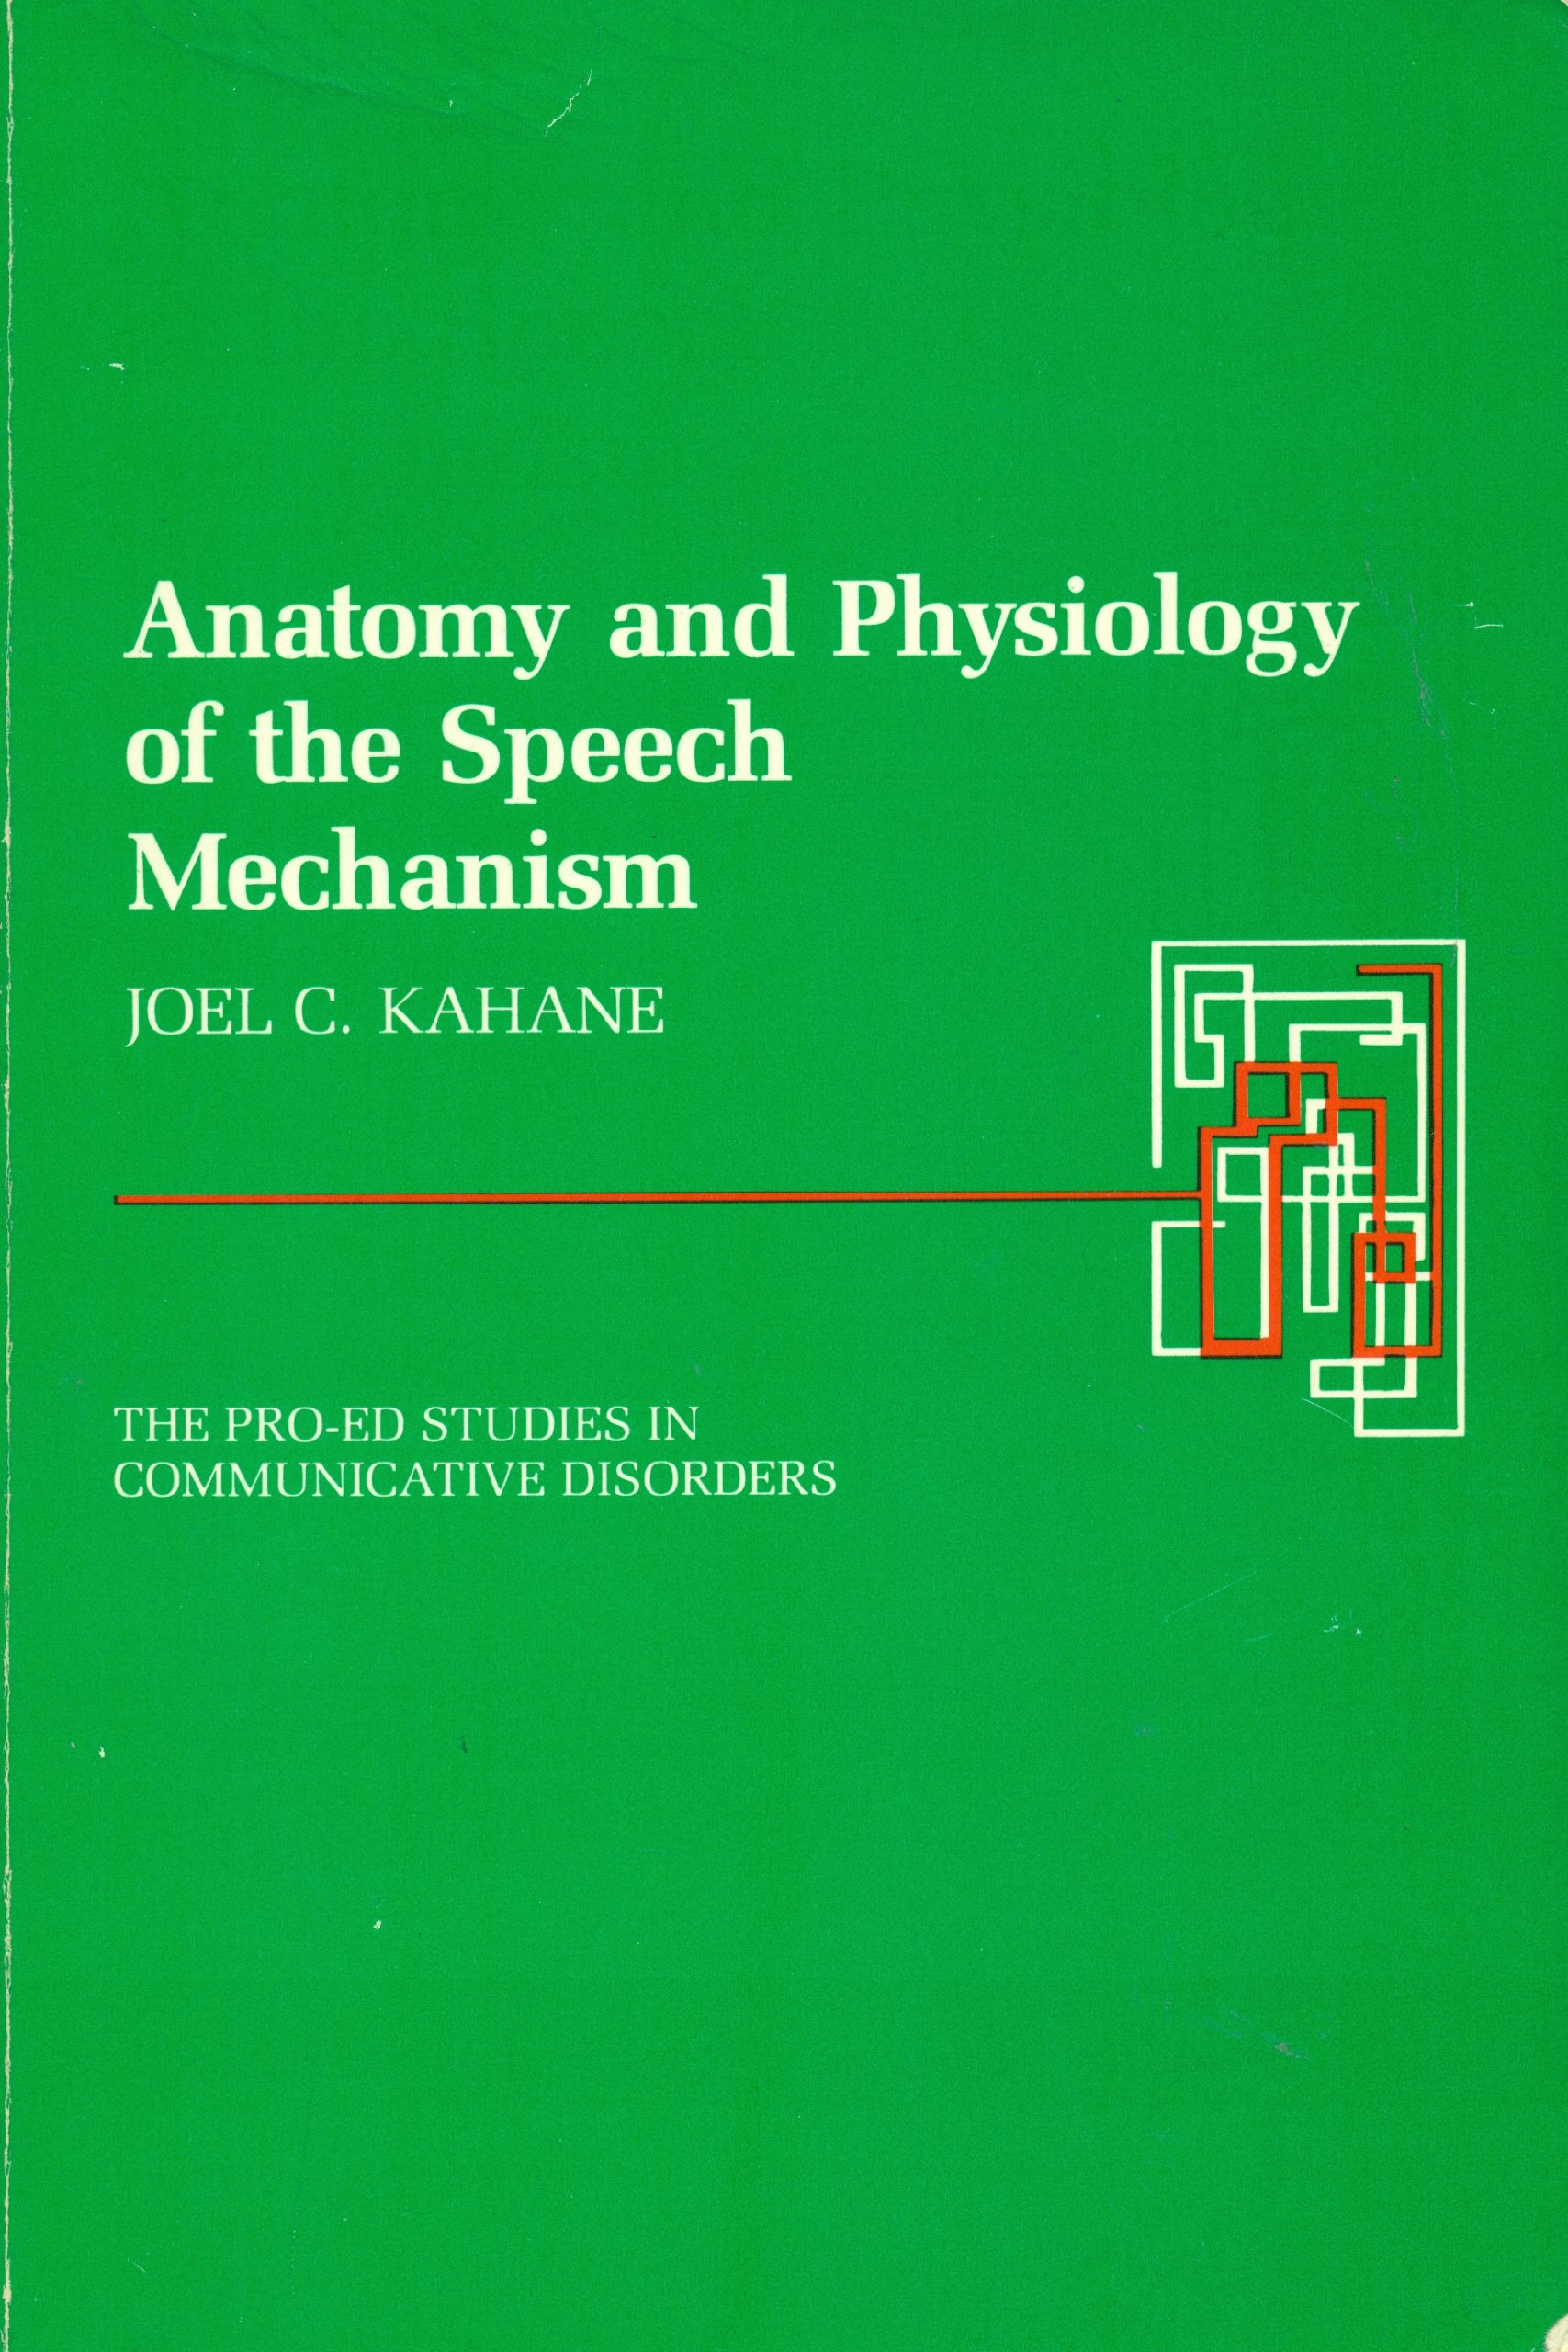 Anatomy and Physiology of the Speech Mechanism: Joel C. Kahane ...